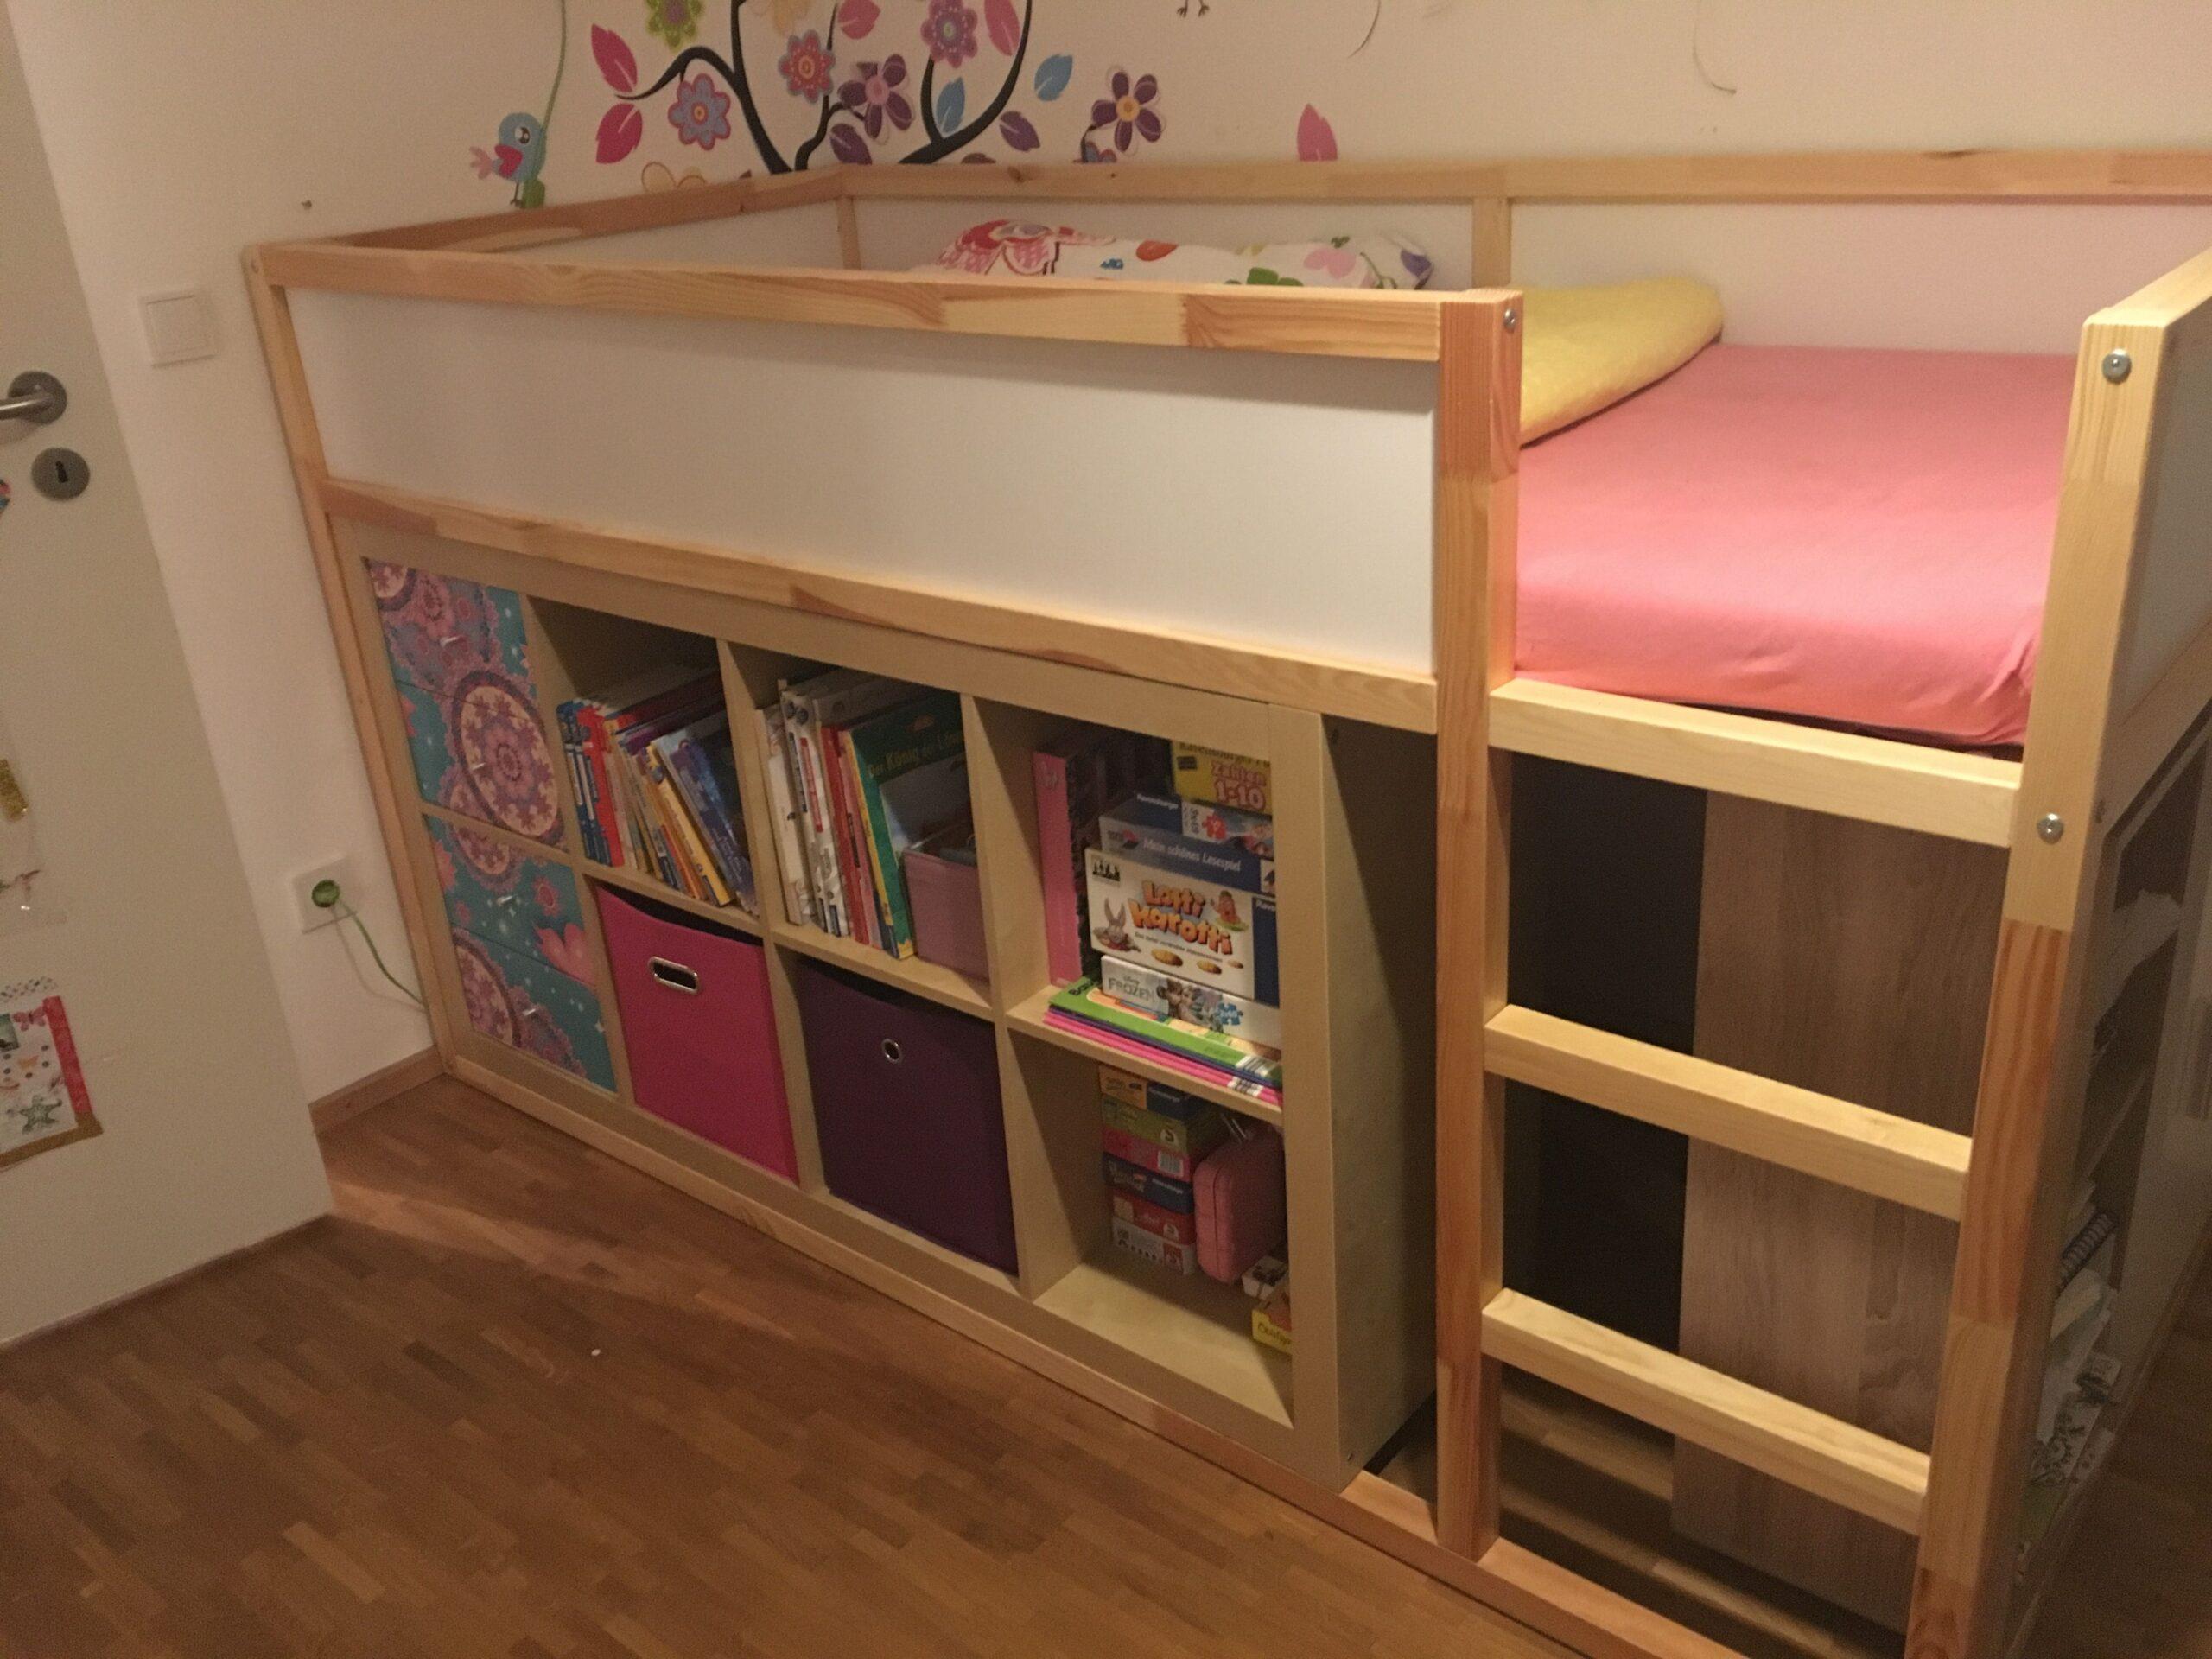 Full Size of Kura Hack Ideas Ikea Bed Storage Montessori House Bunk Hacks Underneath Kallahack With Images Kids Bedroom Wohnzimmer Kura Hack